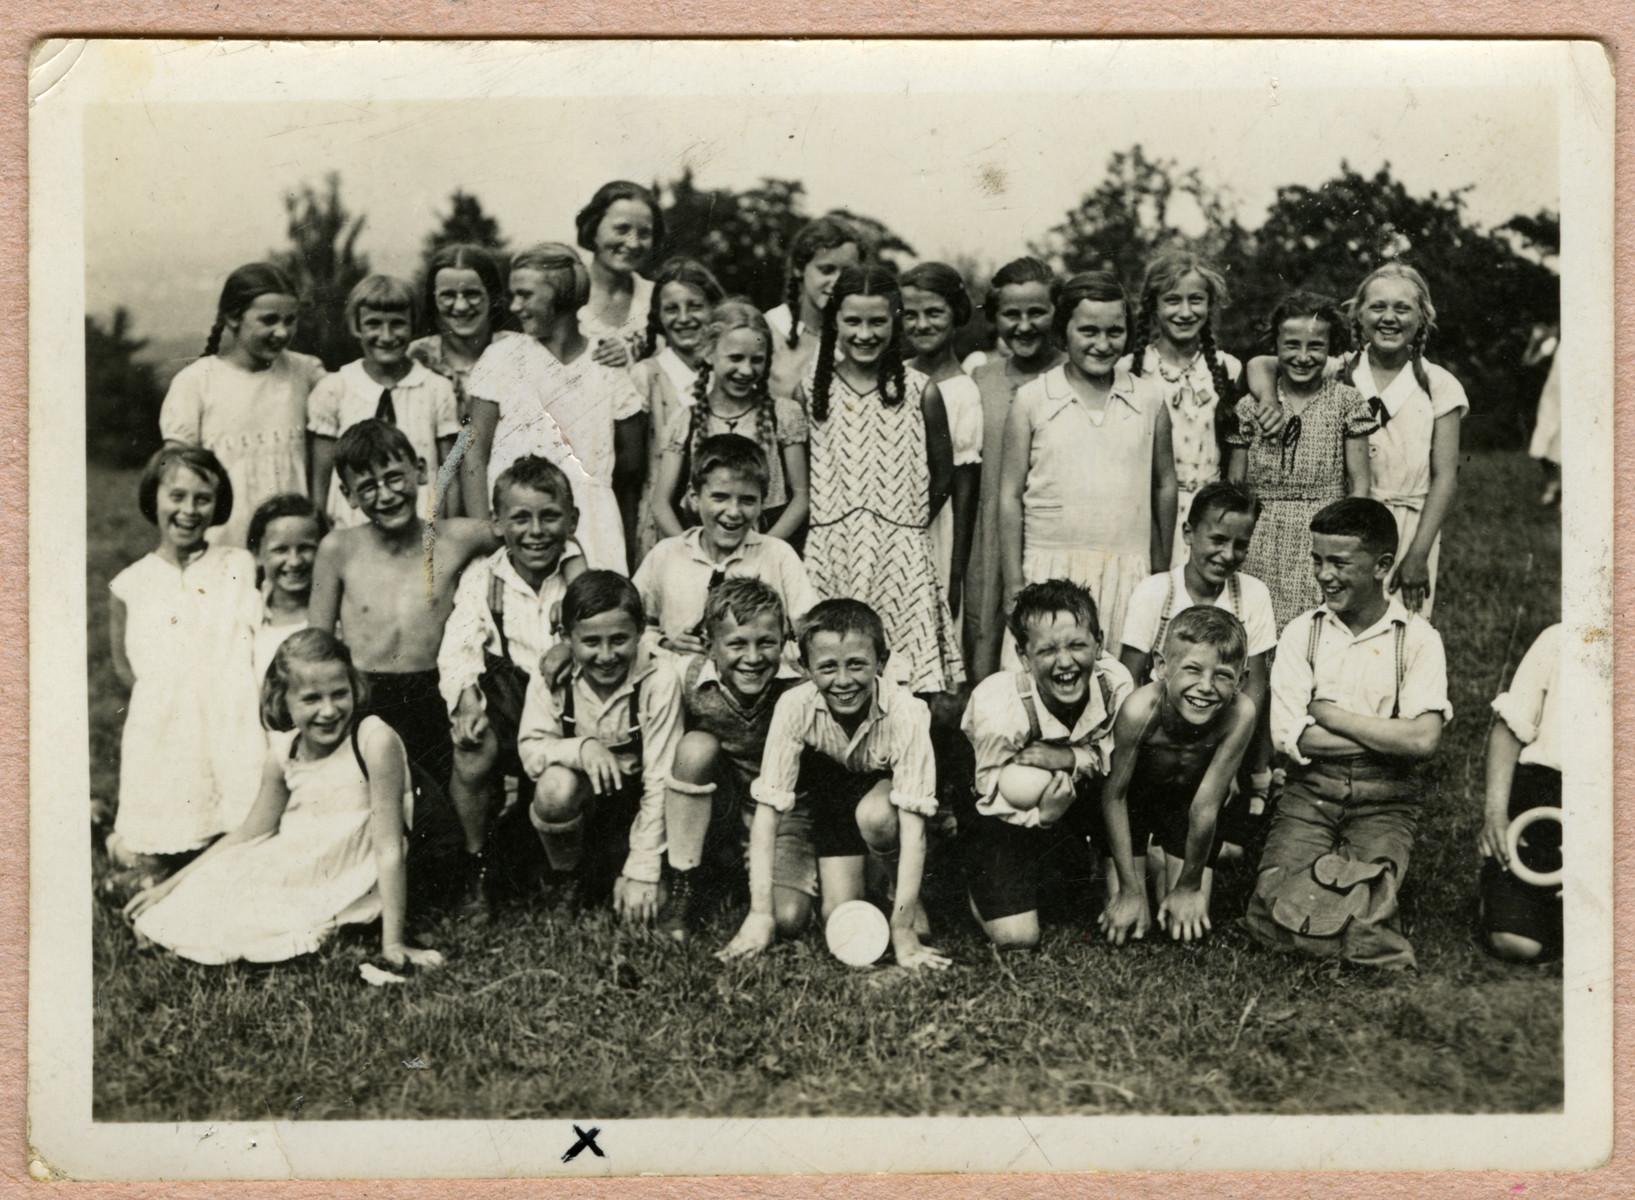 Group portrait of German and Jewish school children.  Kurt Feigenbaum is pictured in the front row, first boy kneeling.